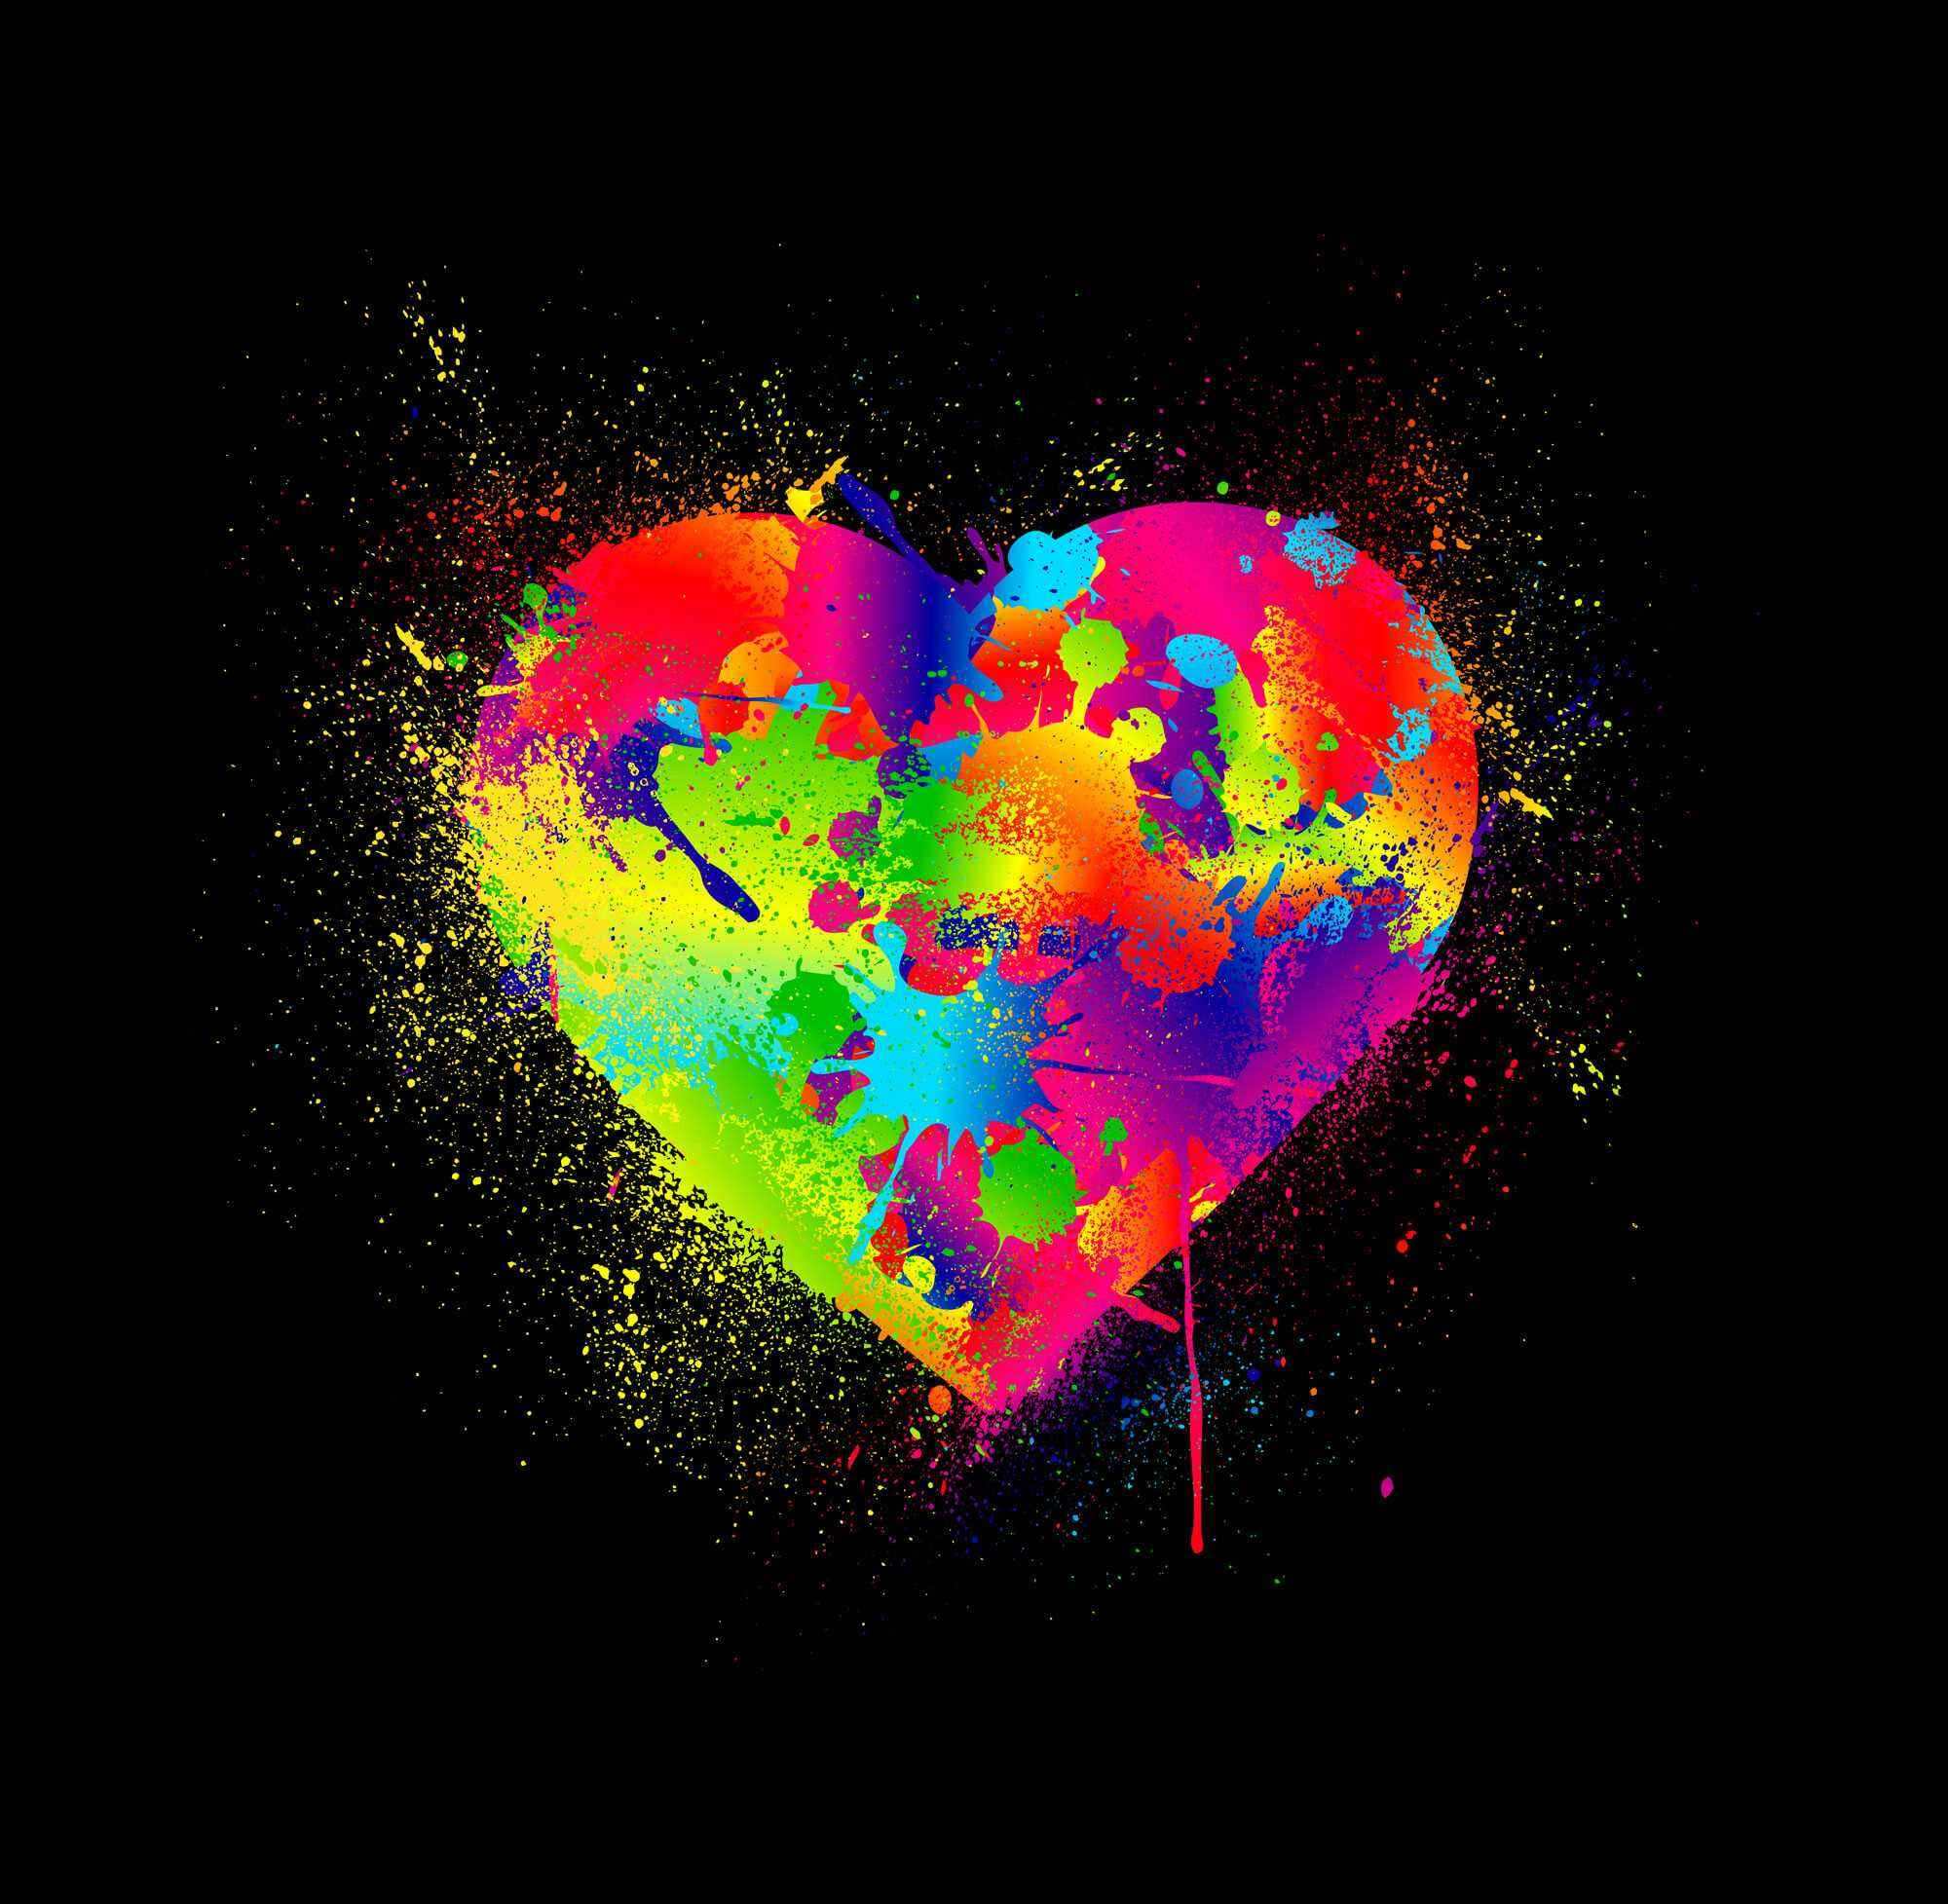 Любовь и яркие краски